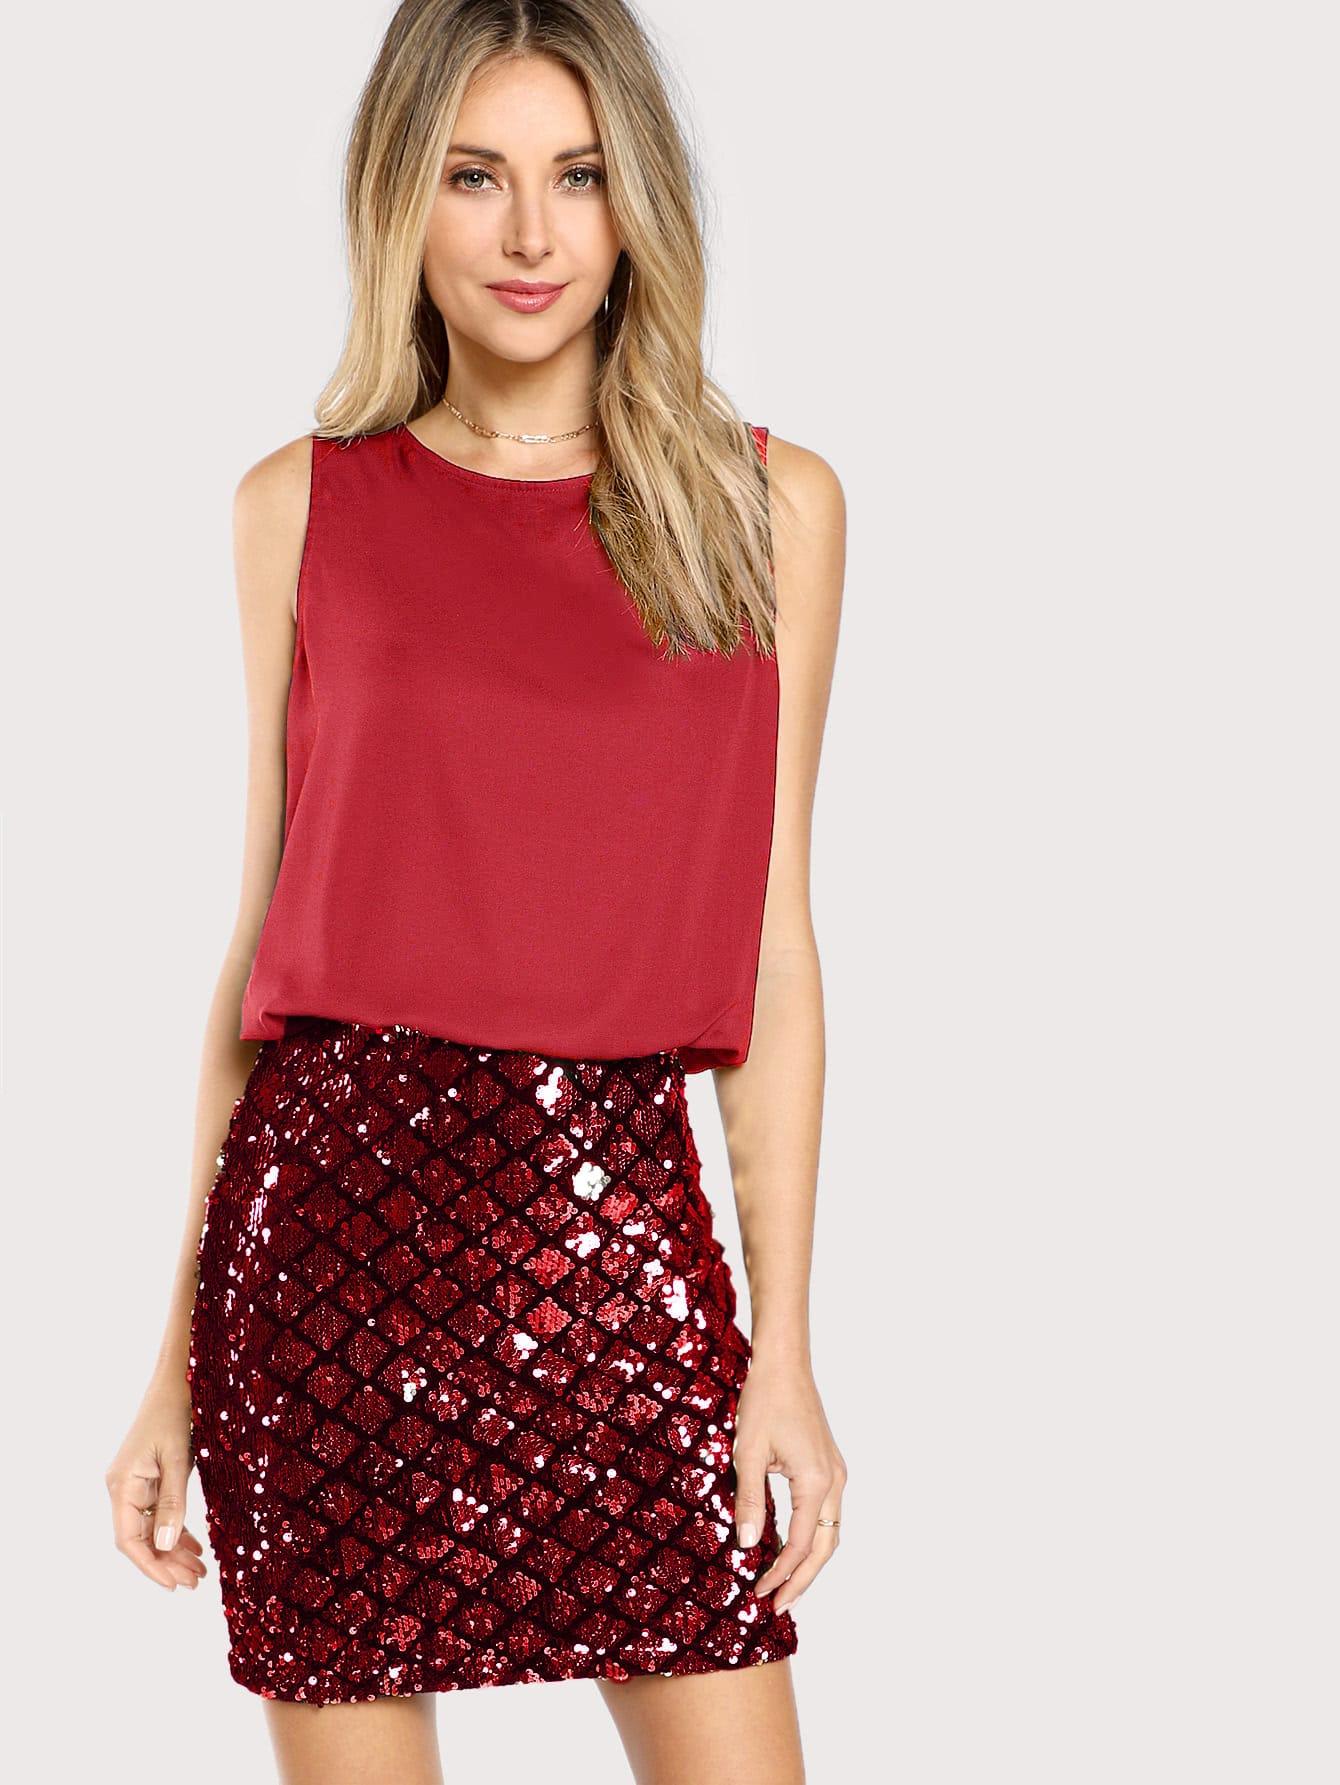 Sequin Embellished Mixed Media Dress surplice neck mixed media dress